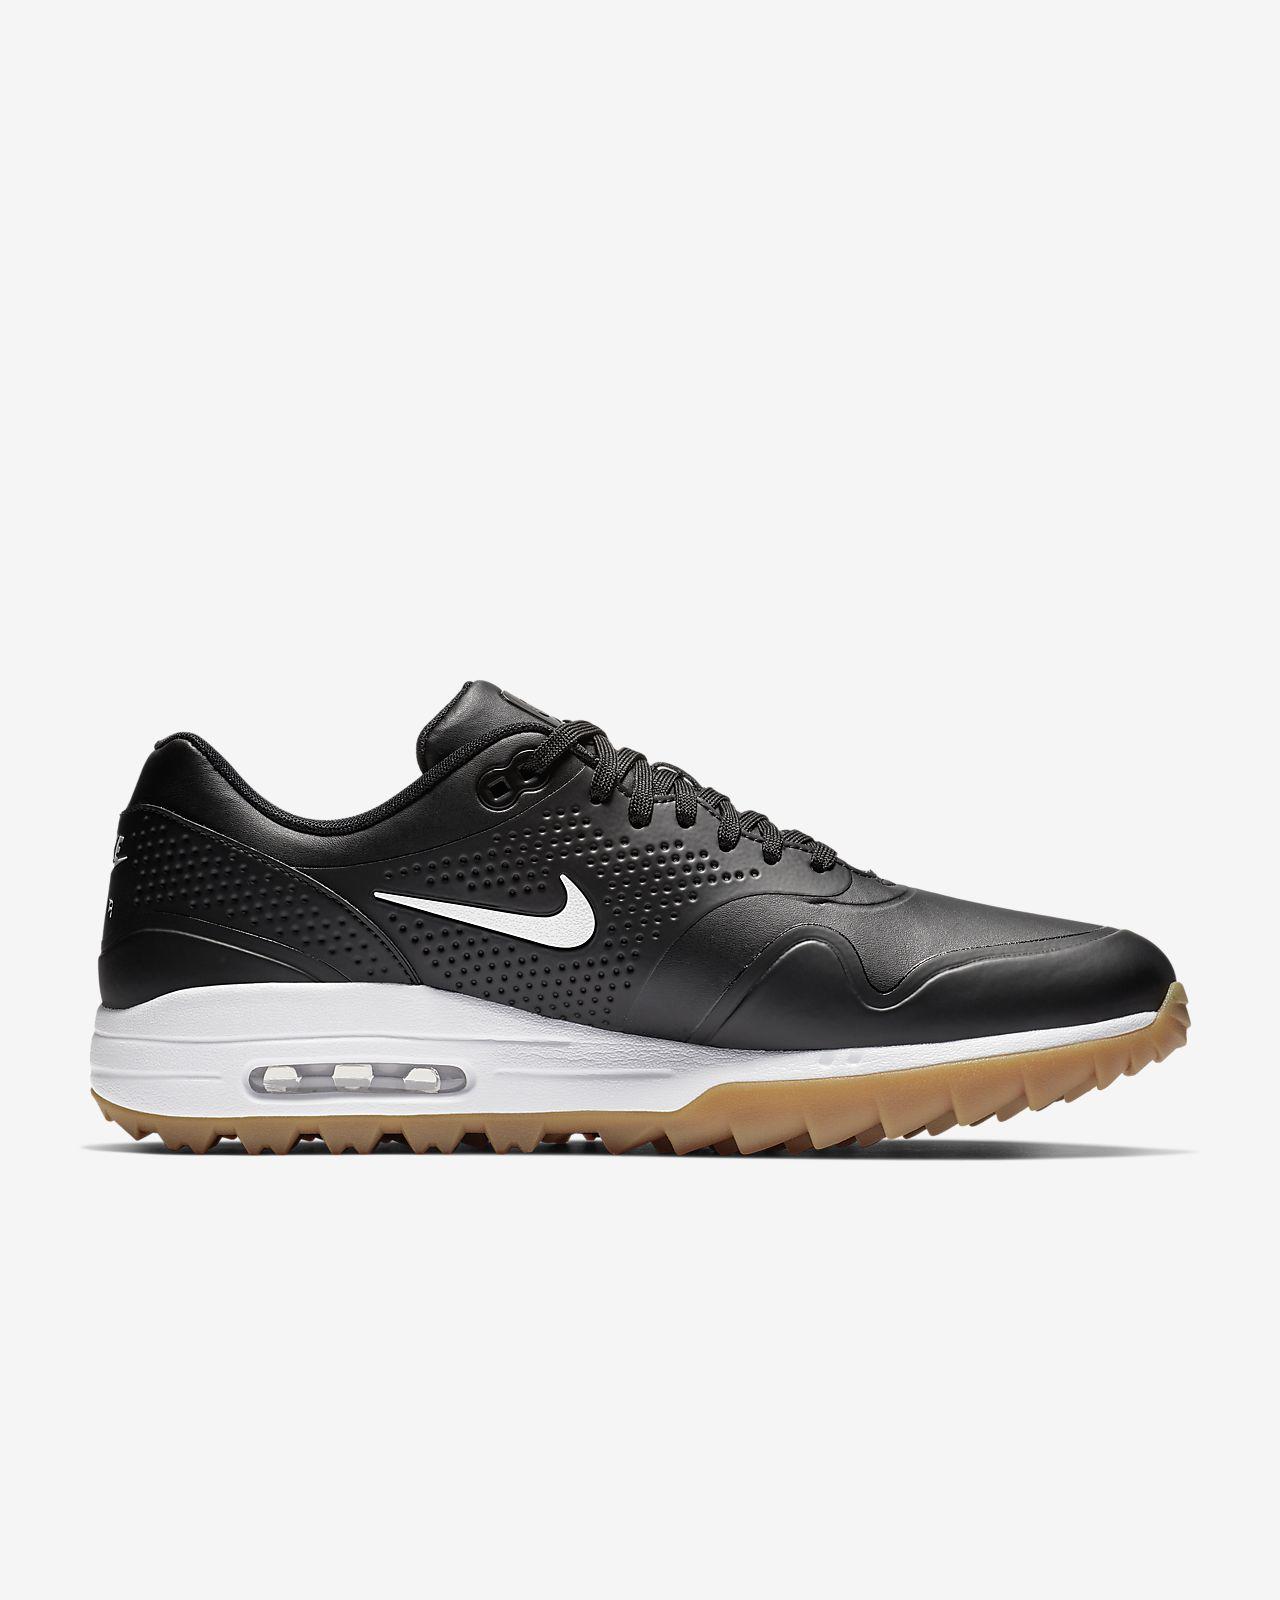 d53f6a58cd2 Chaussure de golf Nike Air Max 1 G pour Homme. Nike.com CA